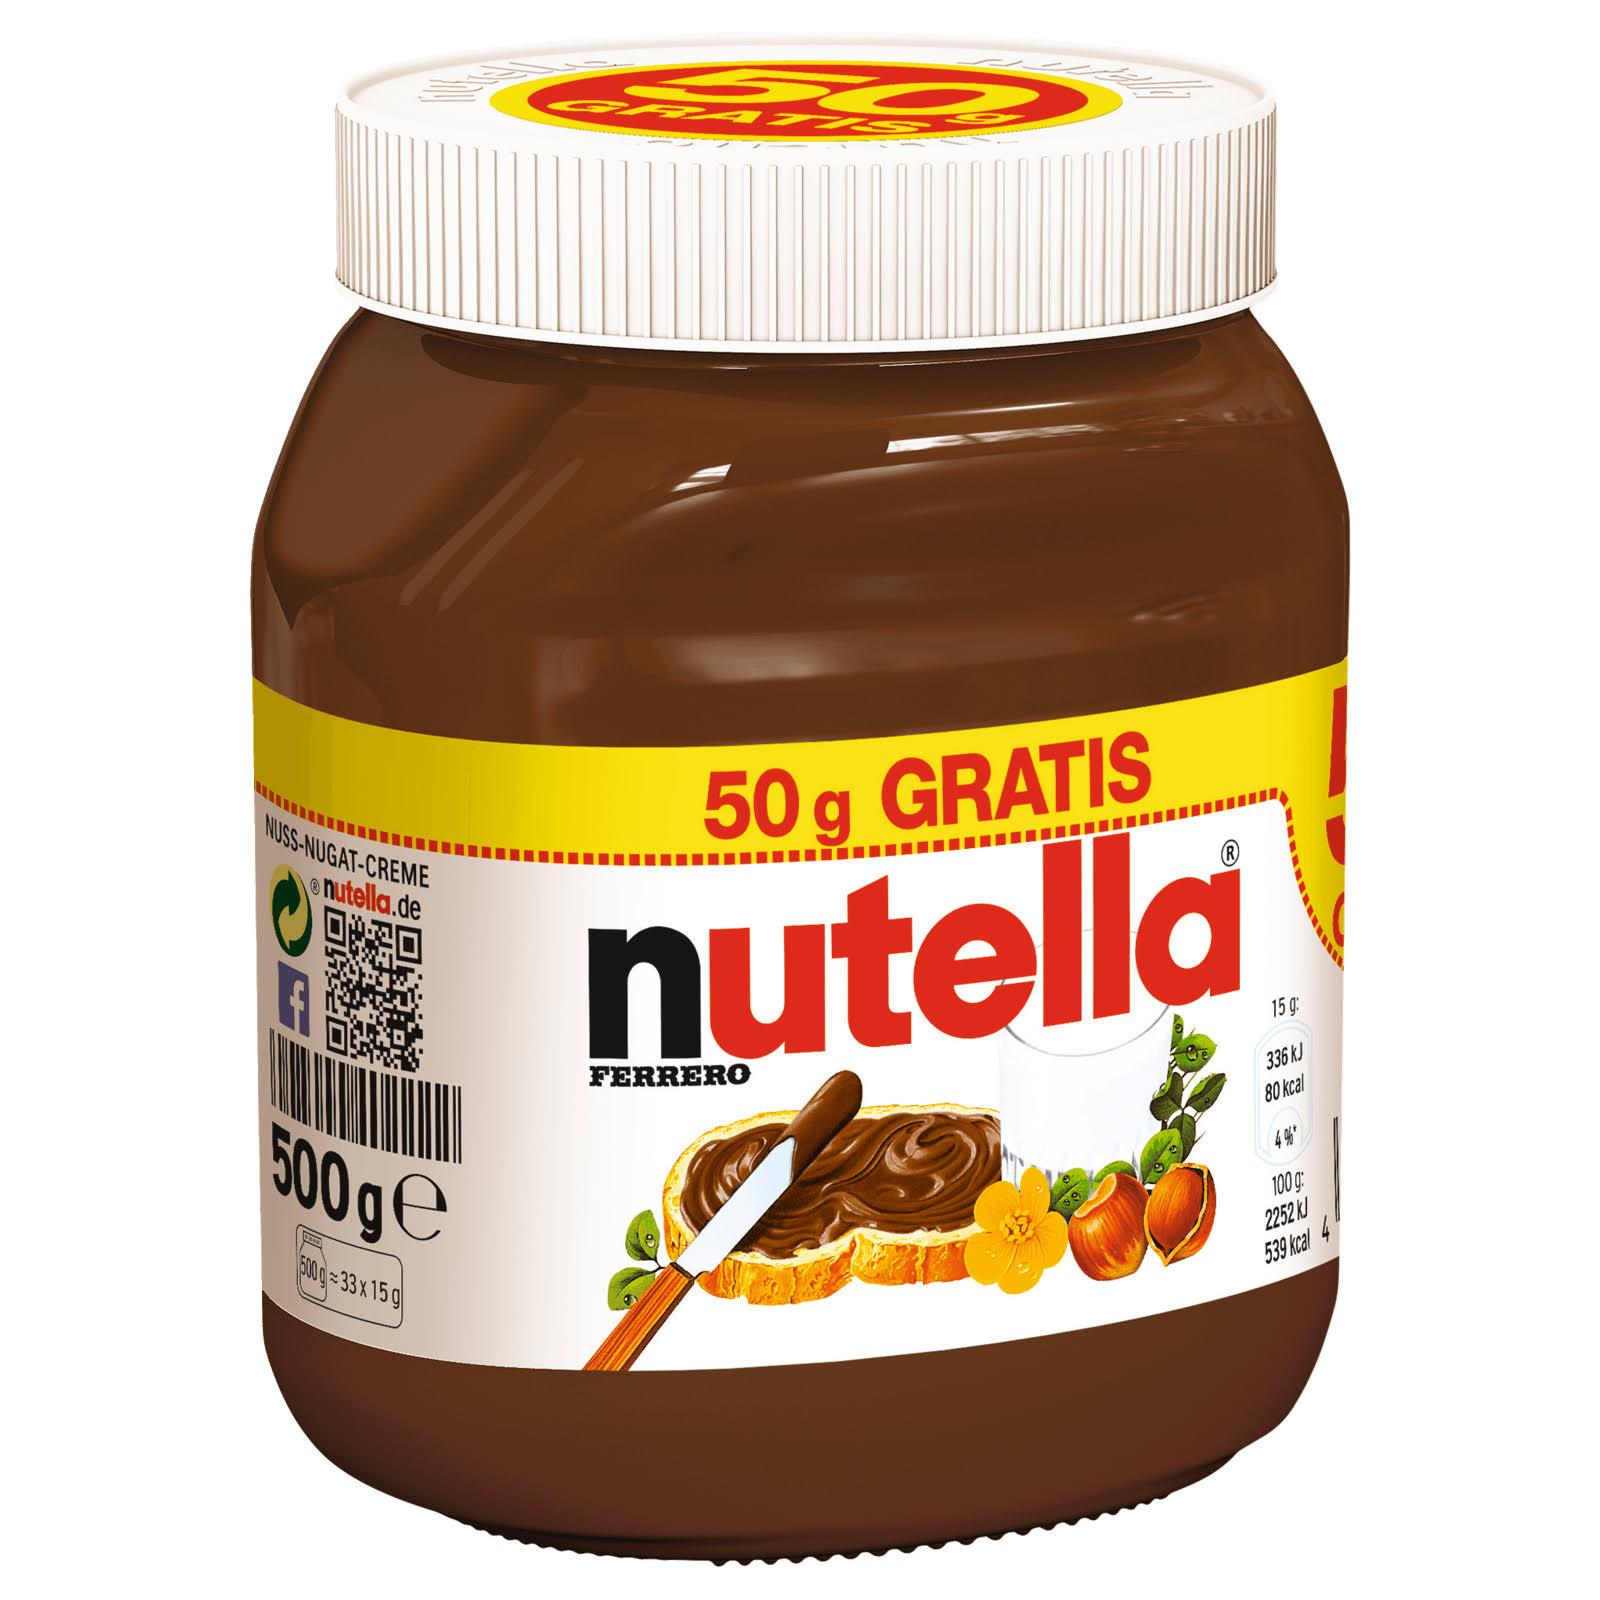 Nutella je 500g Glas für 1,79€ [Real]